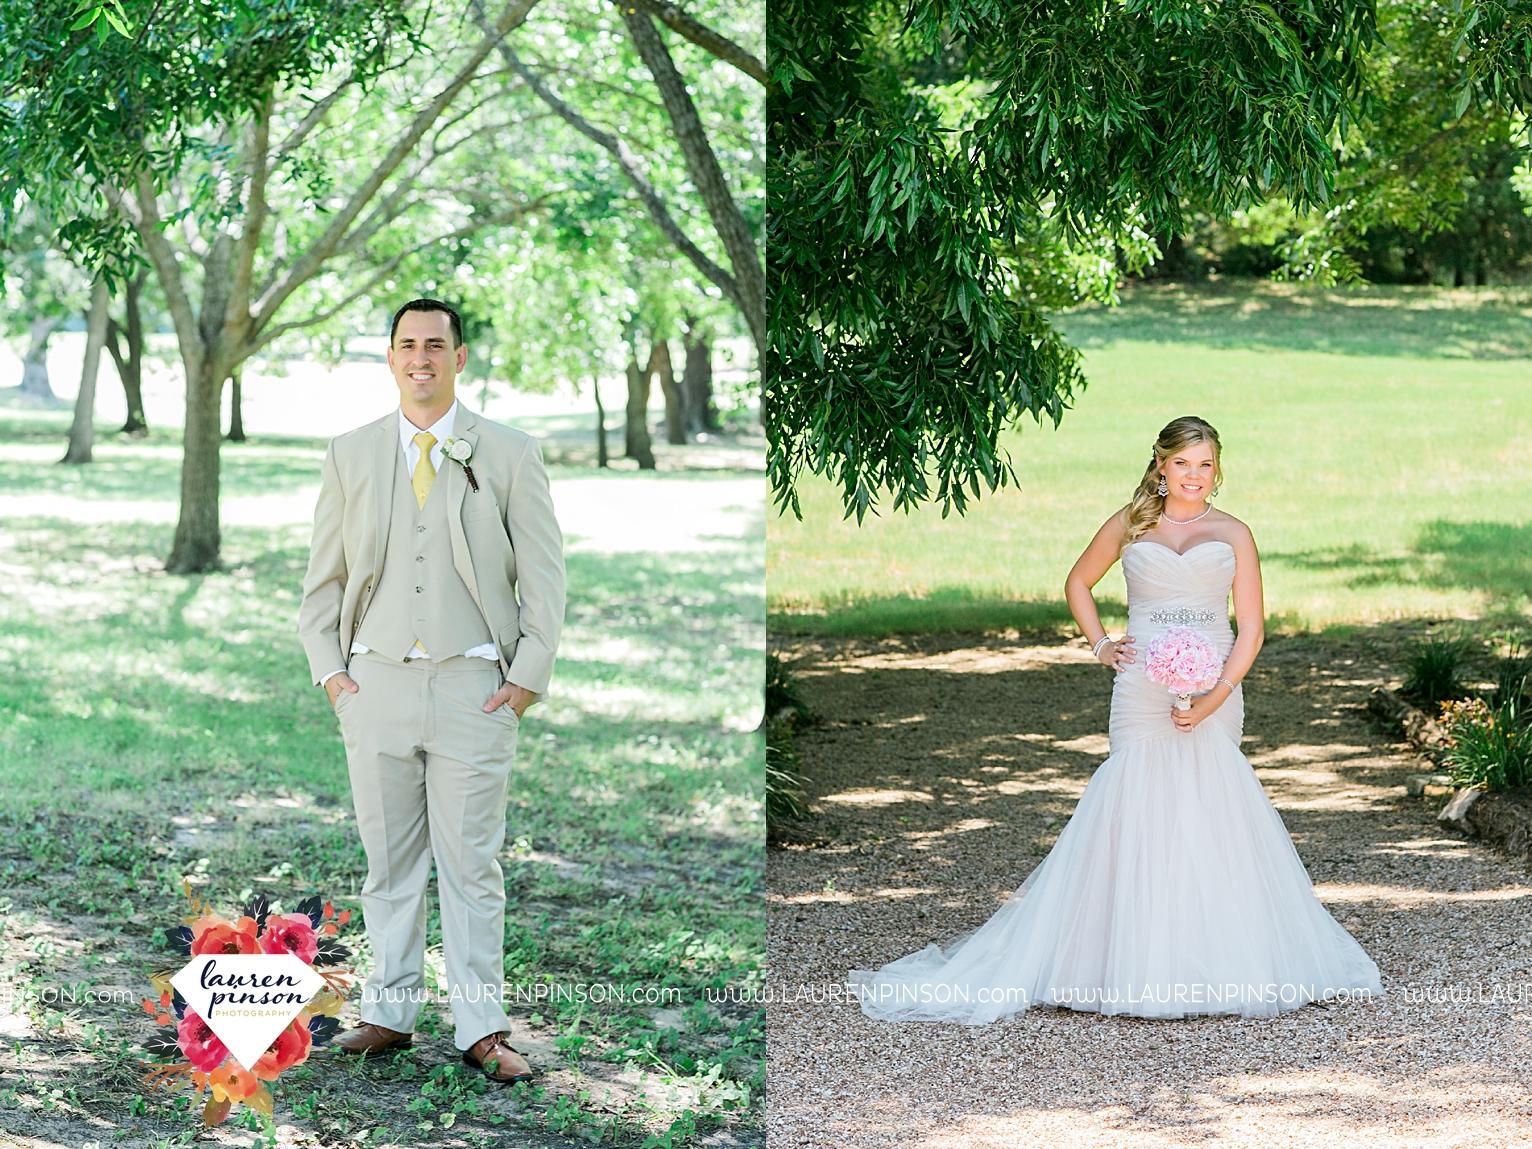 weatherford-texas-hollow-hill-farm-event-wedding-mineral-wells-dfw-wedding-photographer-wichita-falls-photography_3147.jpg